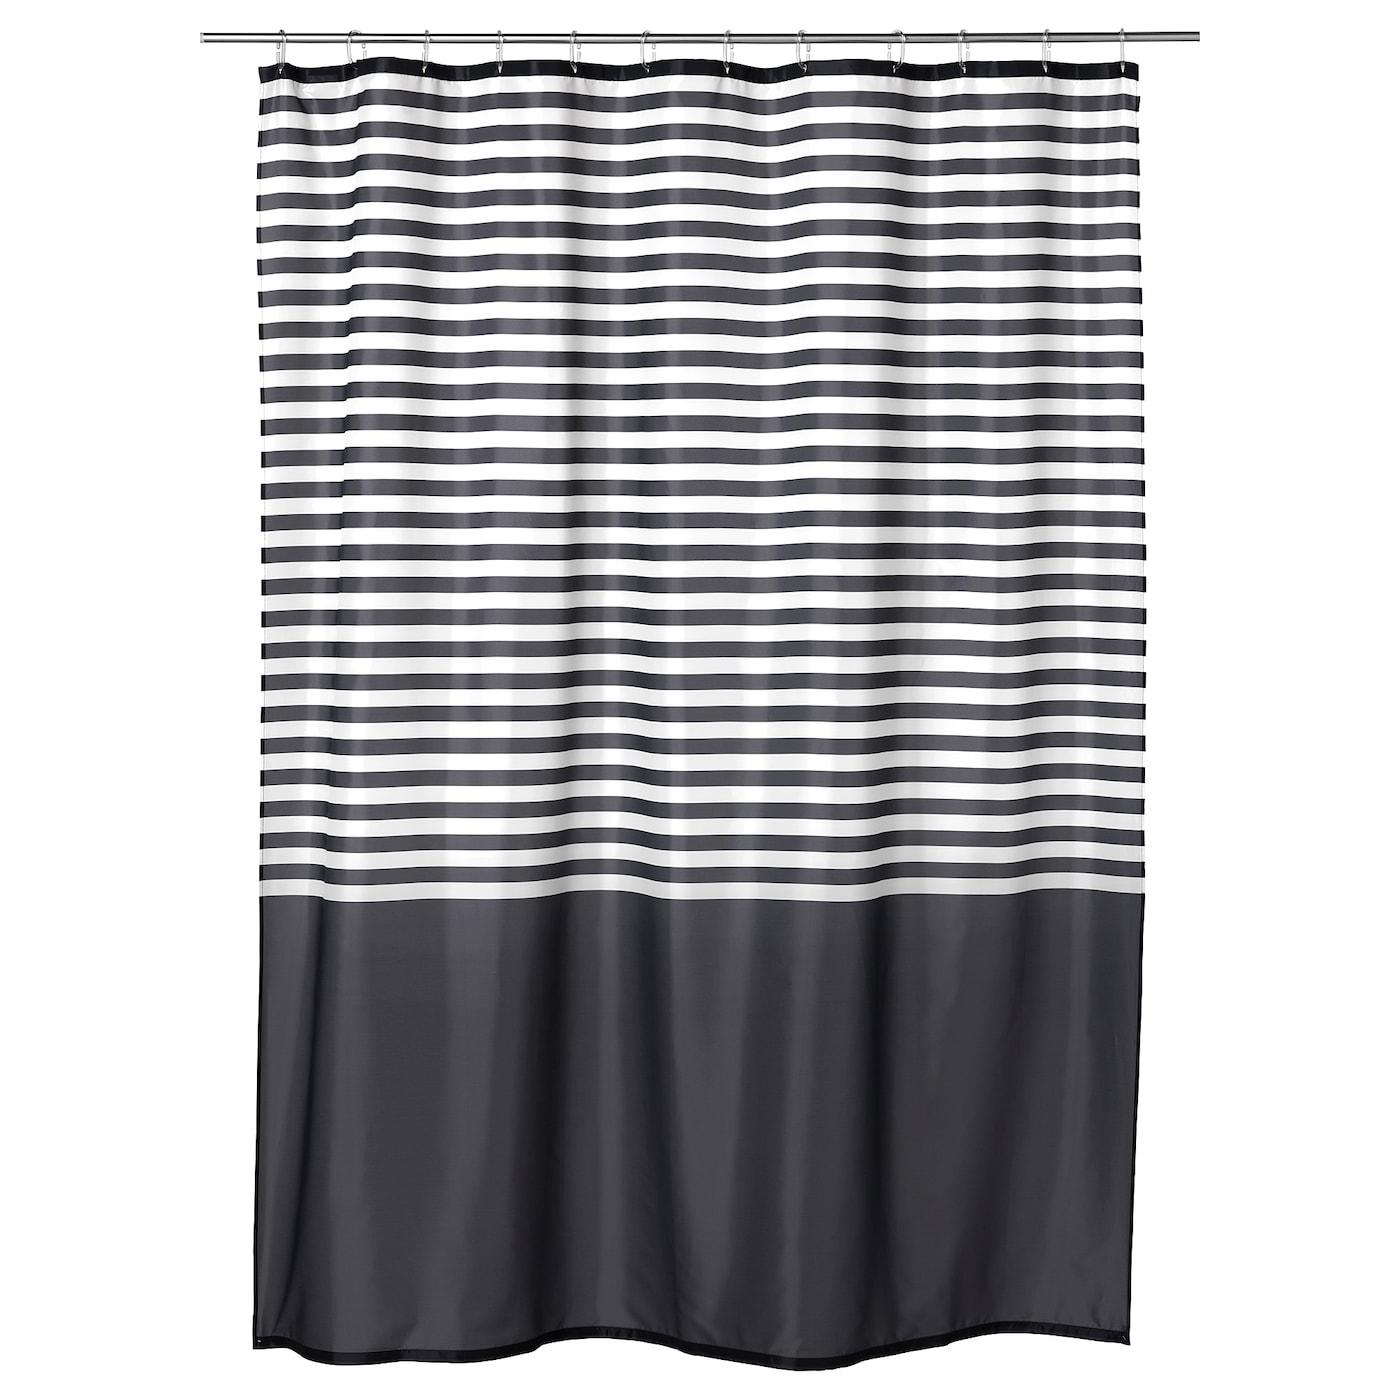 IKEA VADSJON Rideau De Douche Polyester Tisse Serre Avec Revetement Impermeable